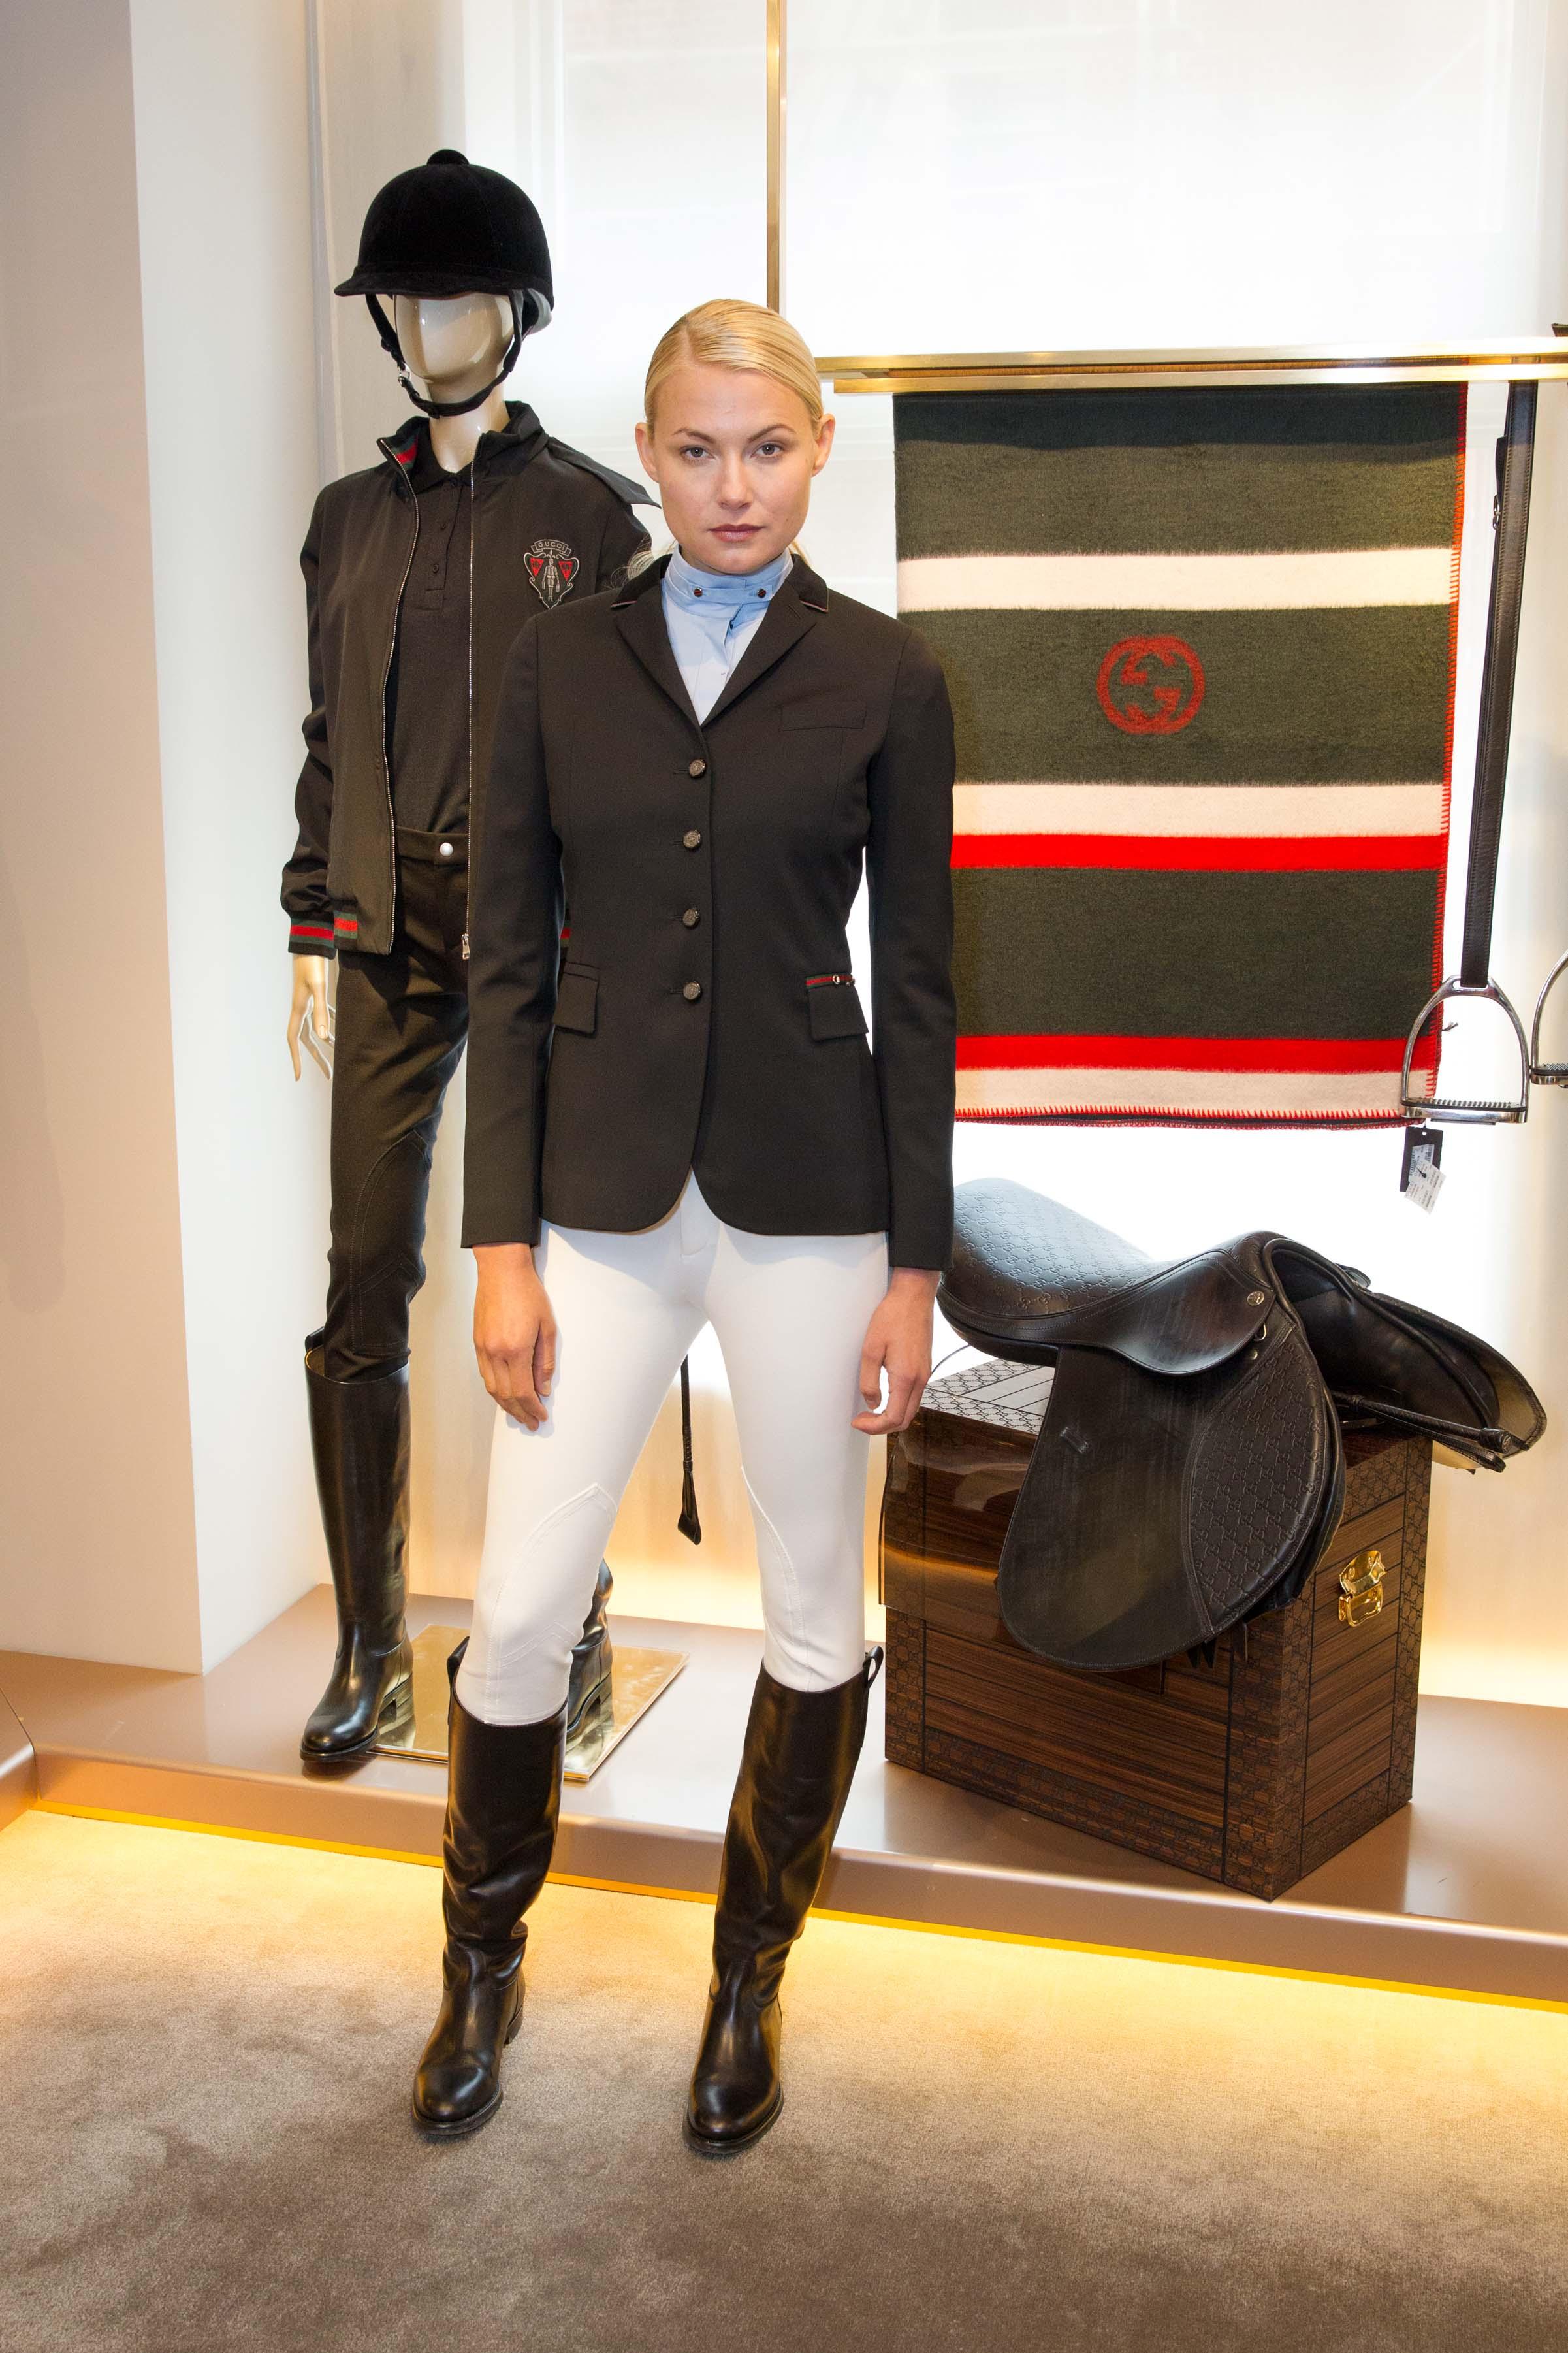 Gucci Equestrian Collection Shown In Sf